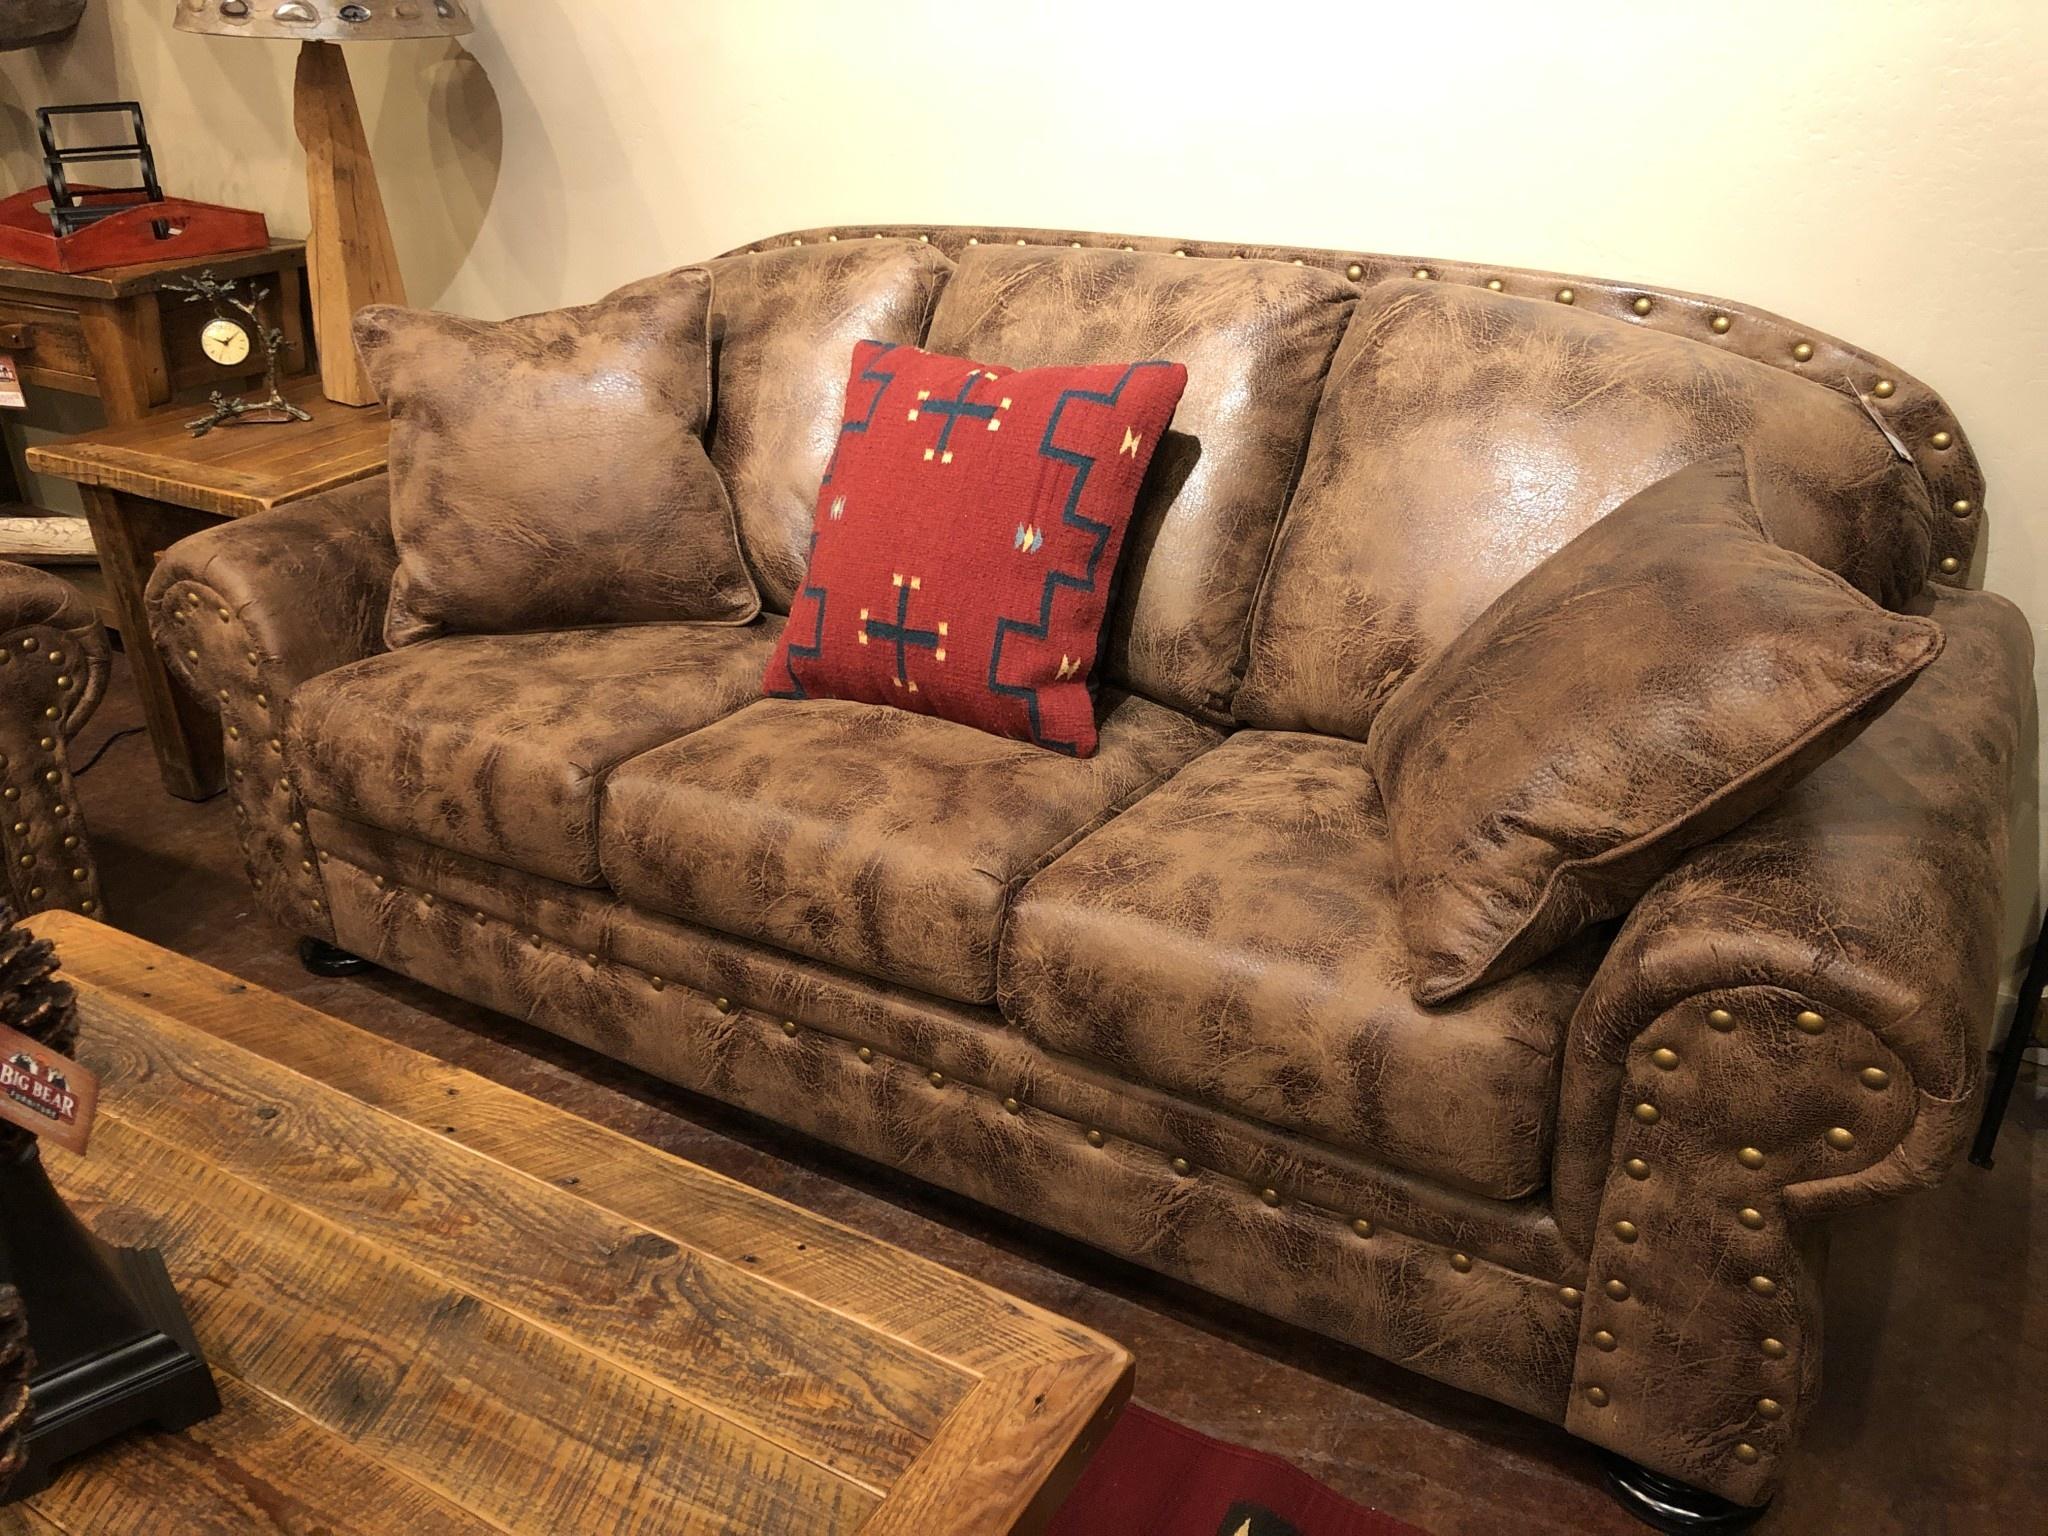 IMF 1054A-71 Sleeper Sofa